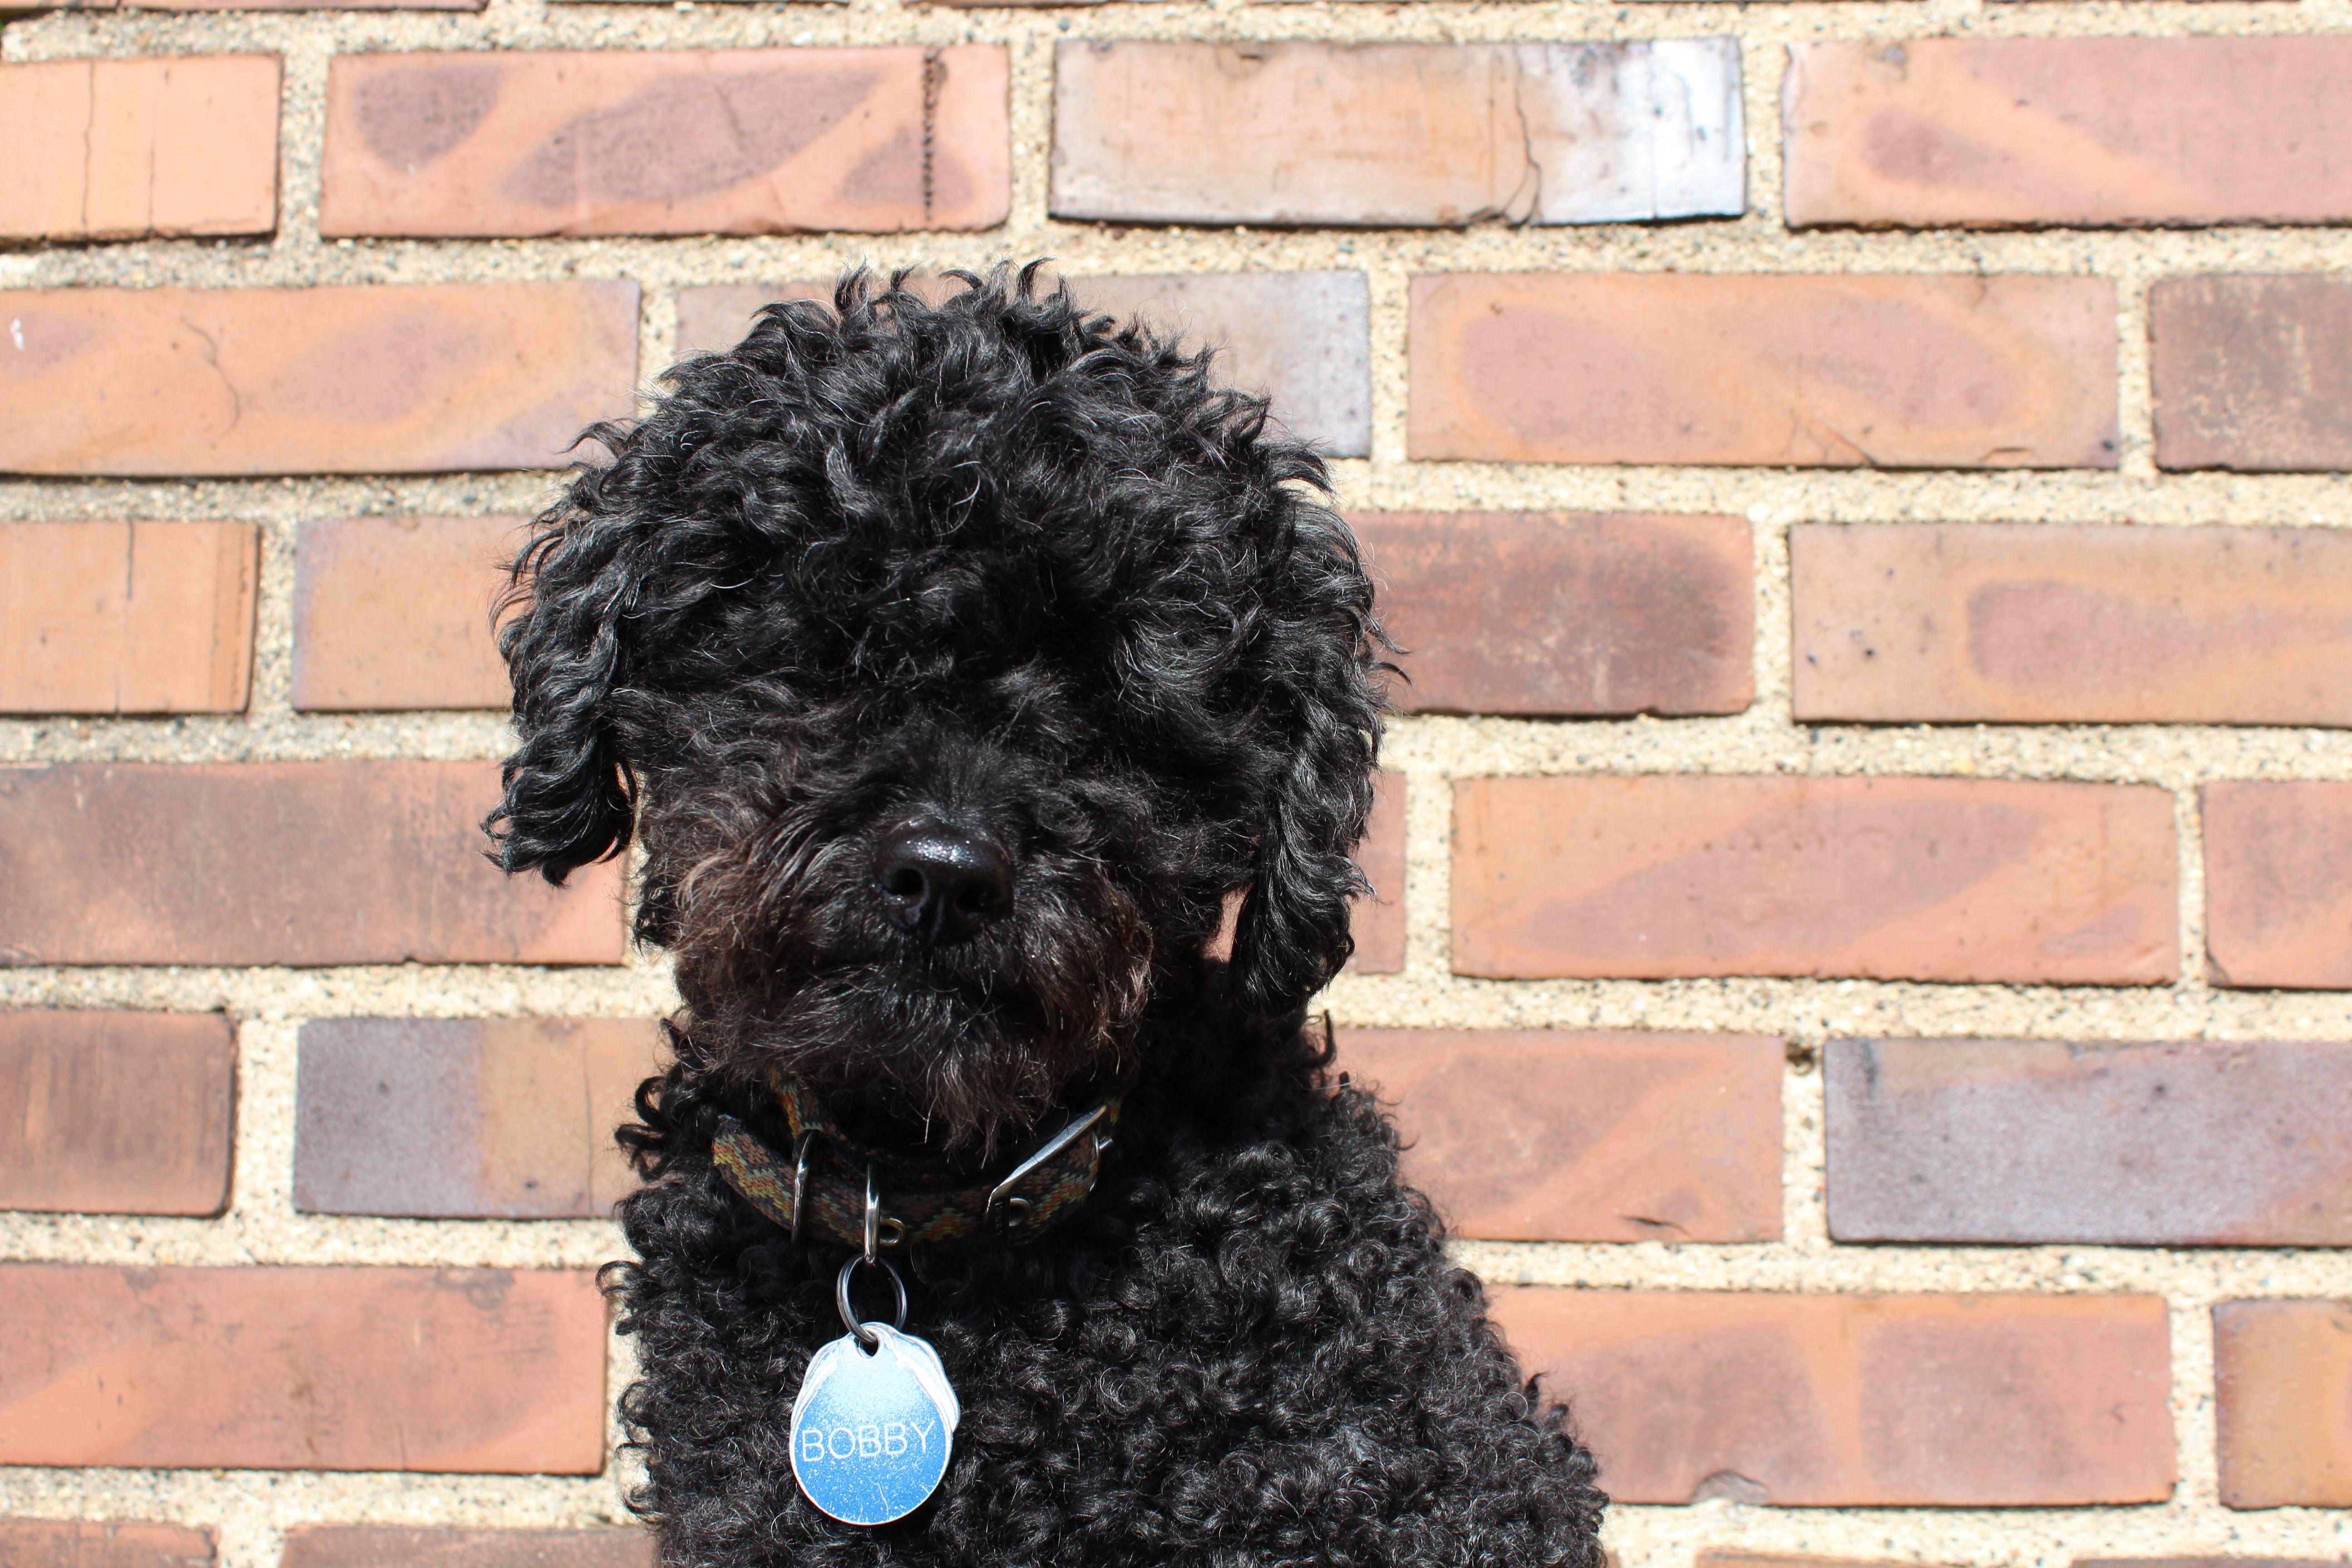 Bob the Office Dog